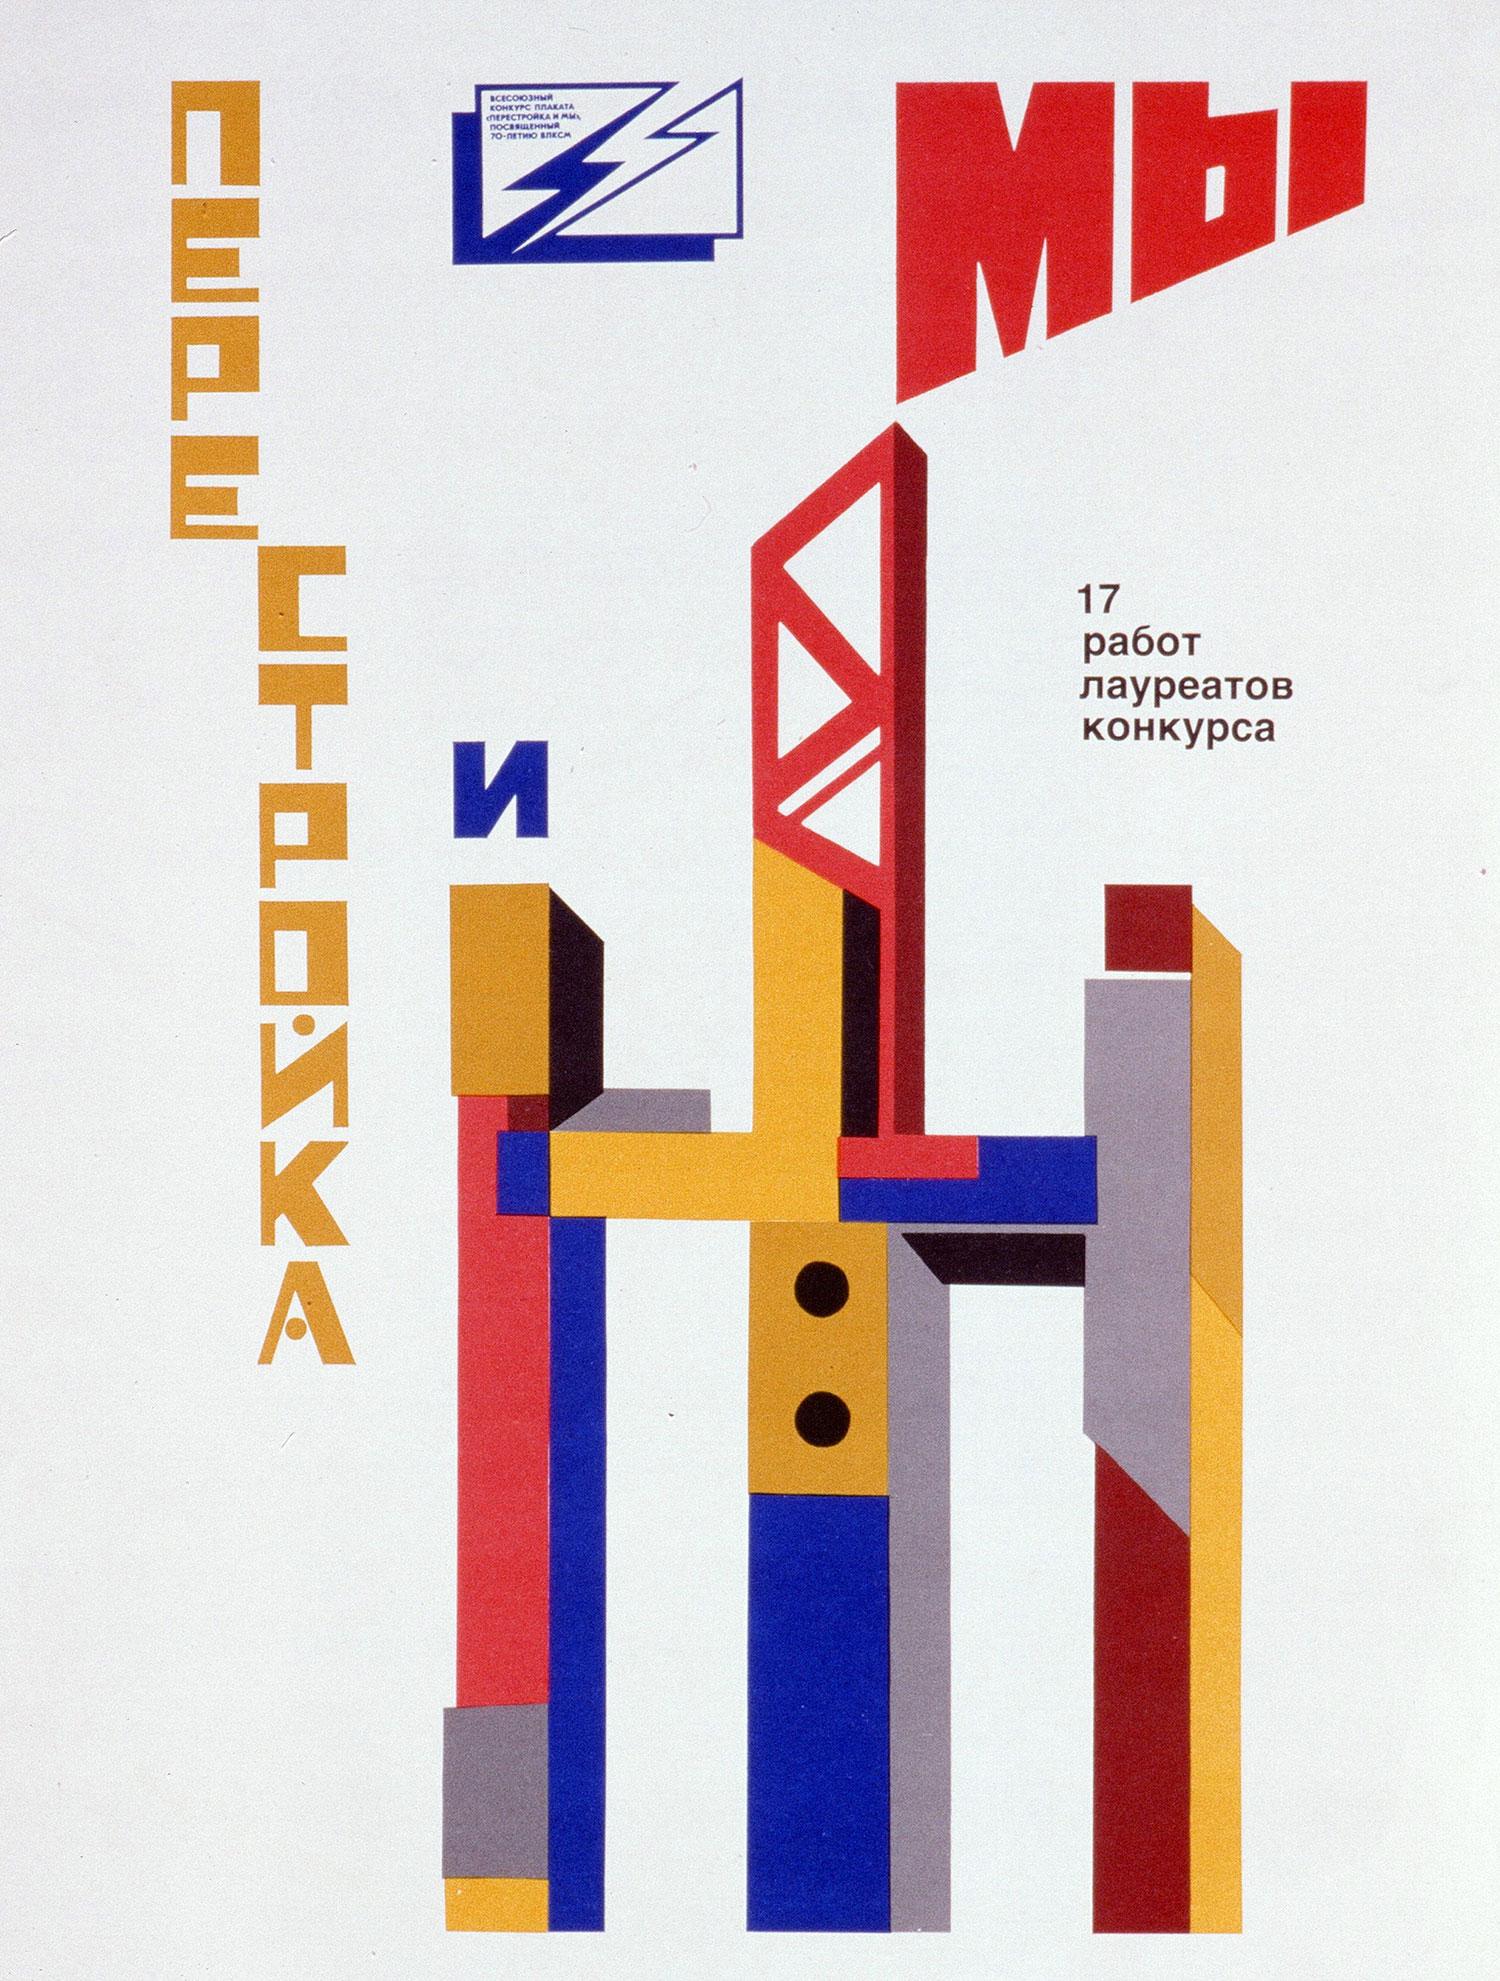 ron-miriello-grafico-soviet-posters-aiga-san-diego-community-design-Miriello-branding-officina-06.jpg